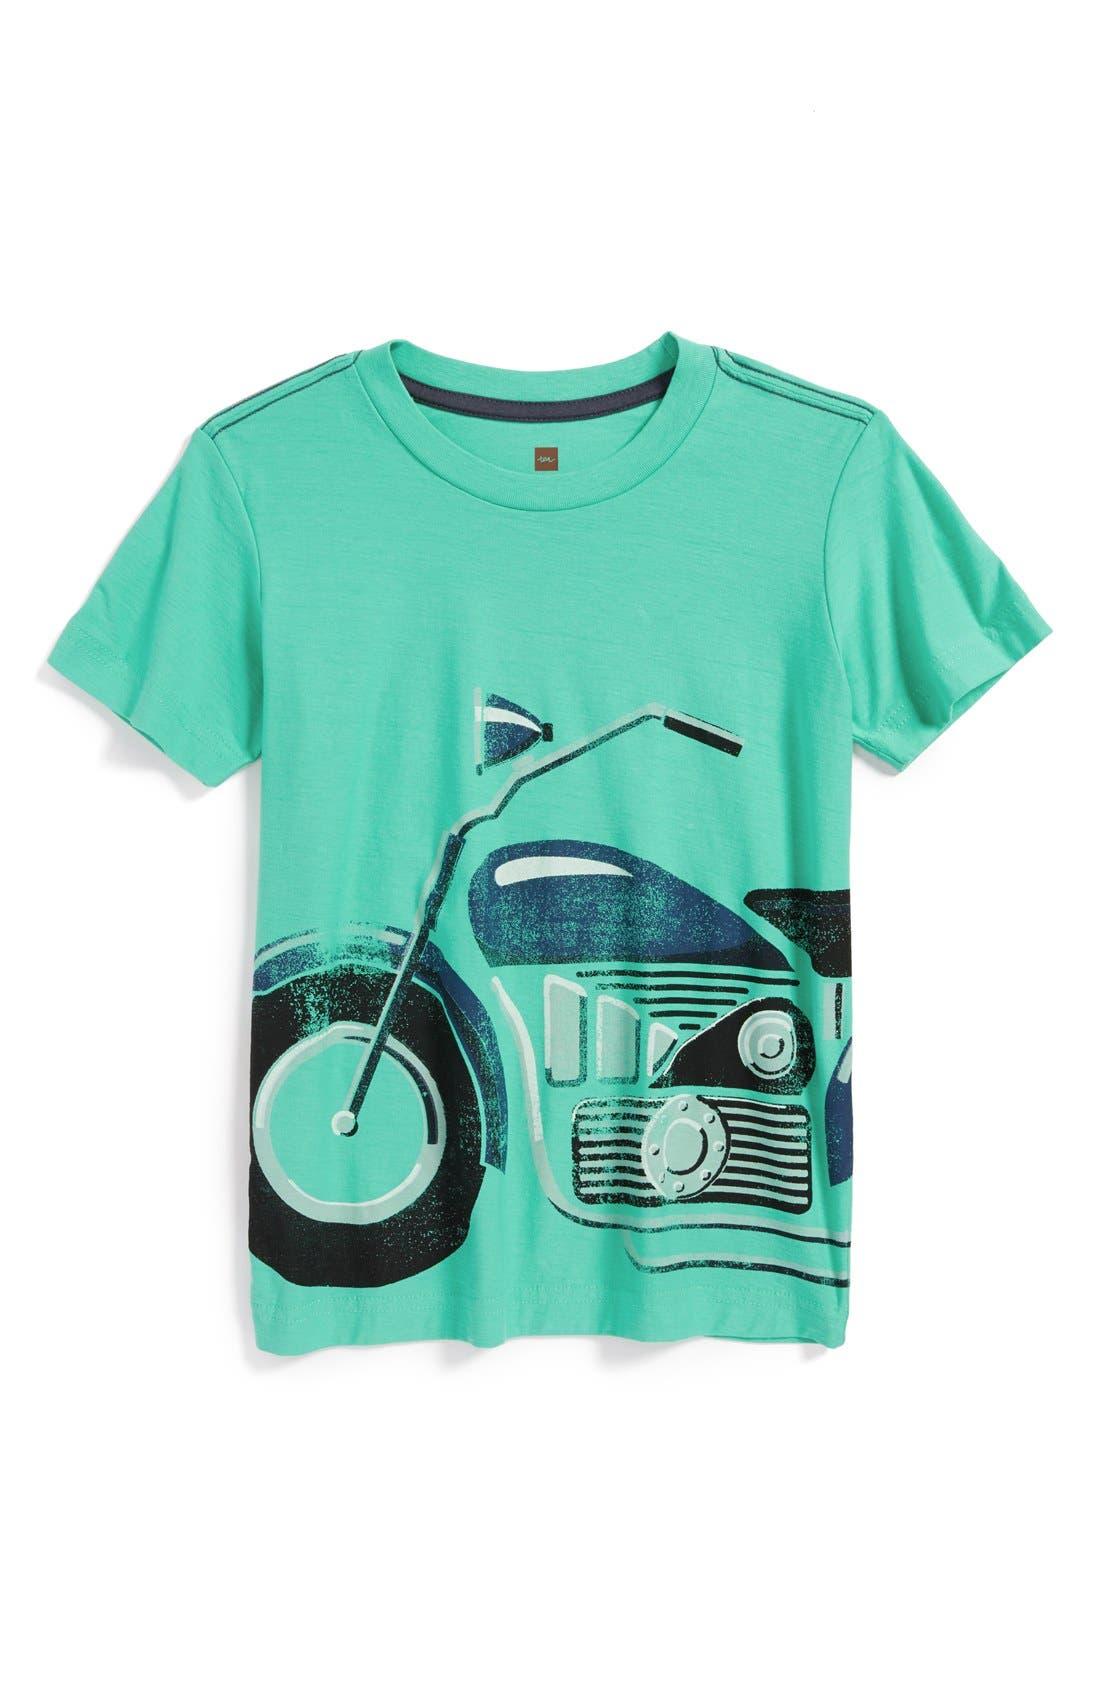 Alternate Image 1 Selected - Tea Collection 'Motorrad' Graphic T-Shirt (Toddler Boys & Little Boys)